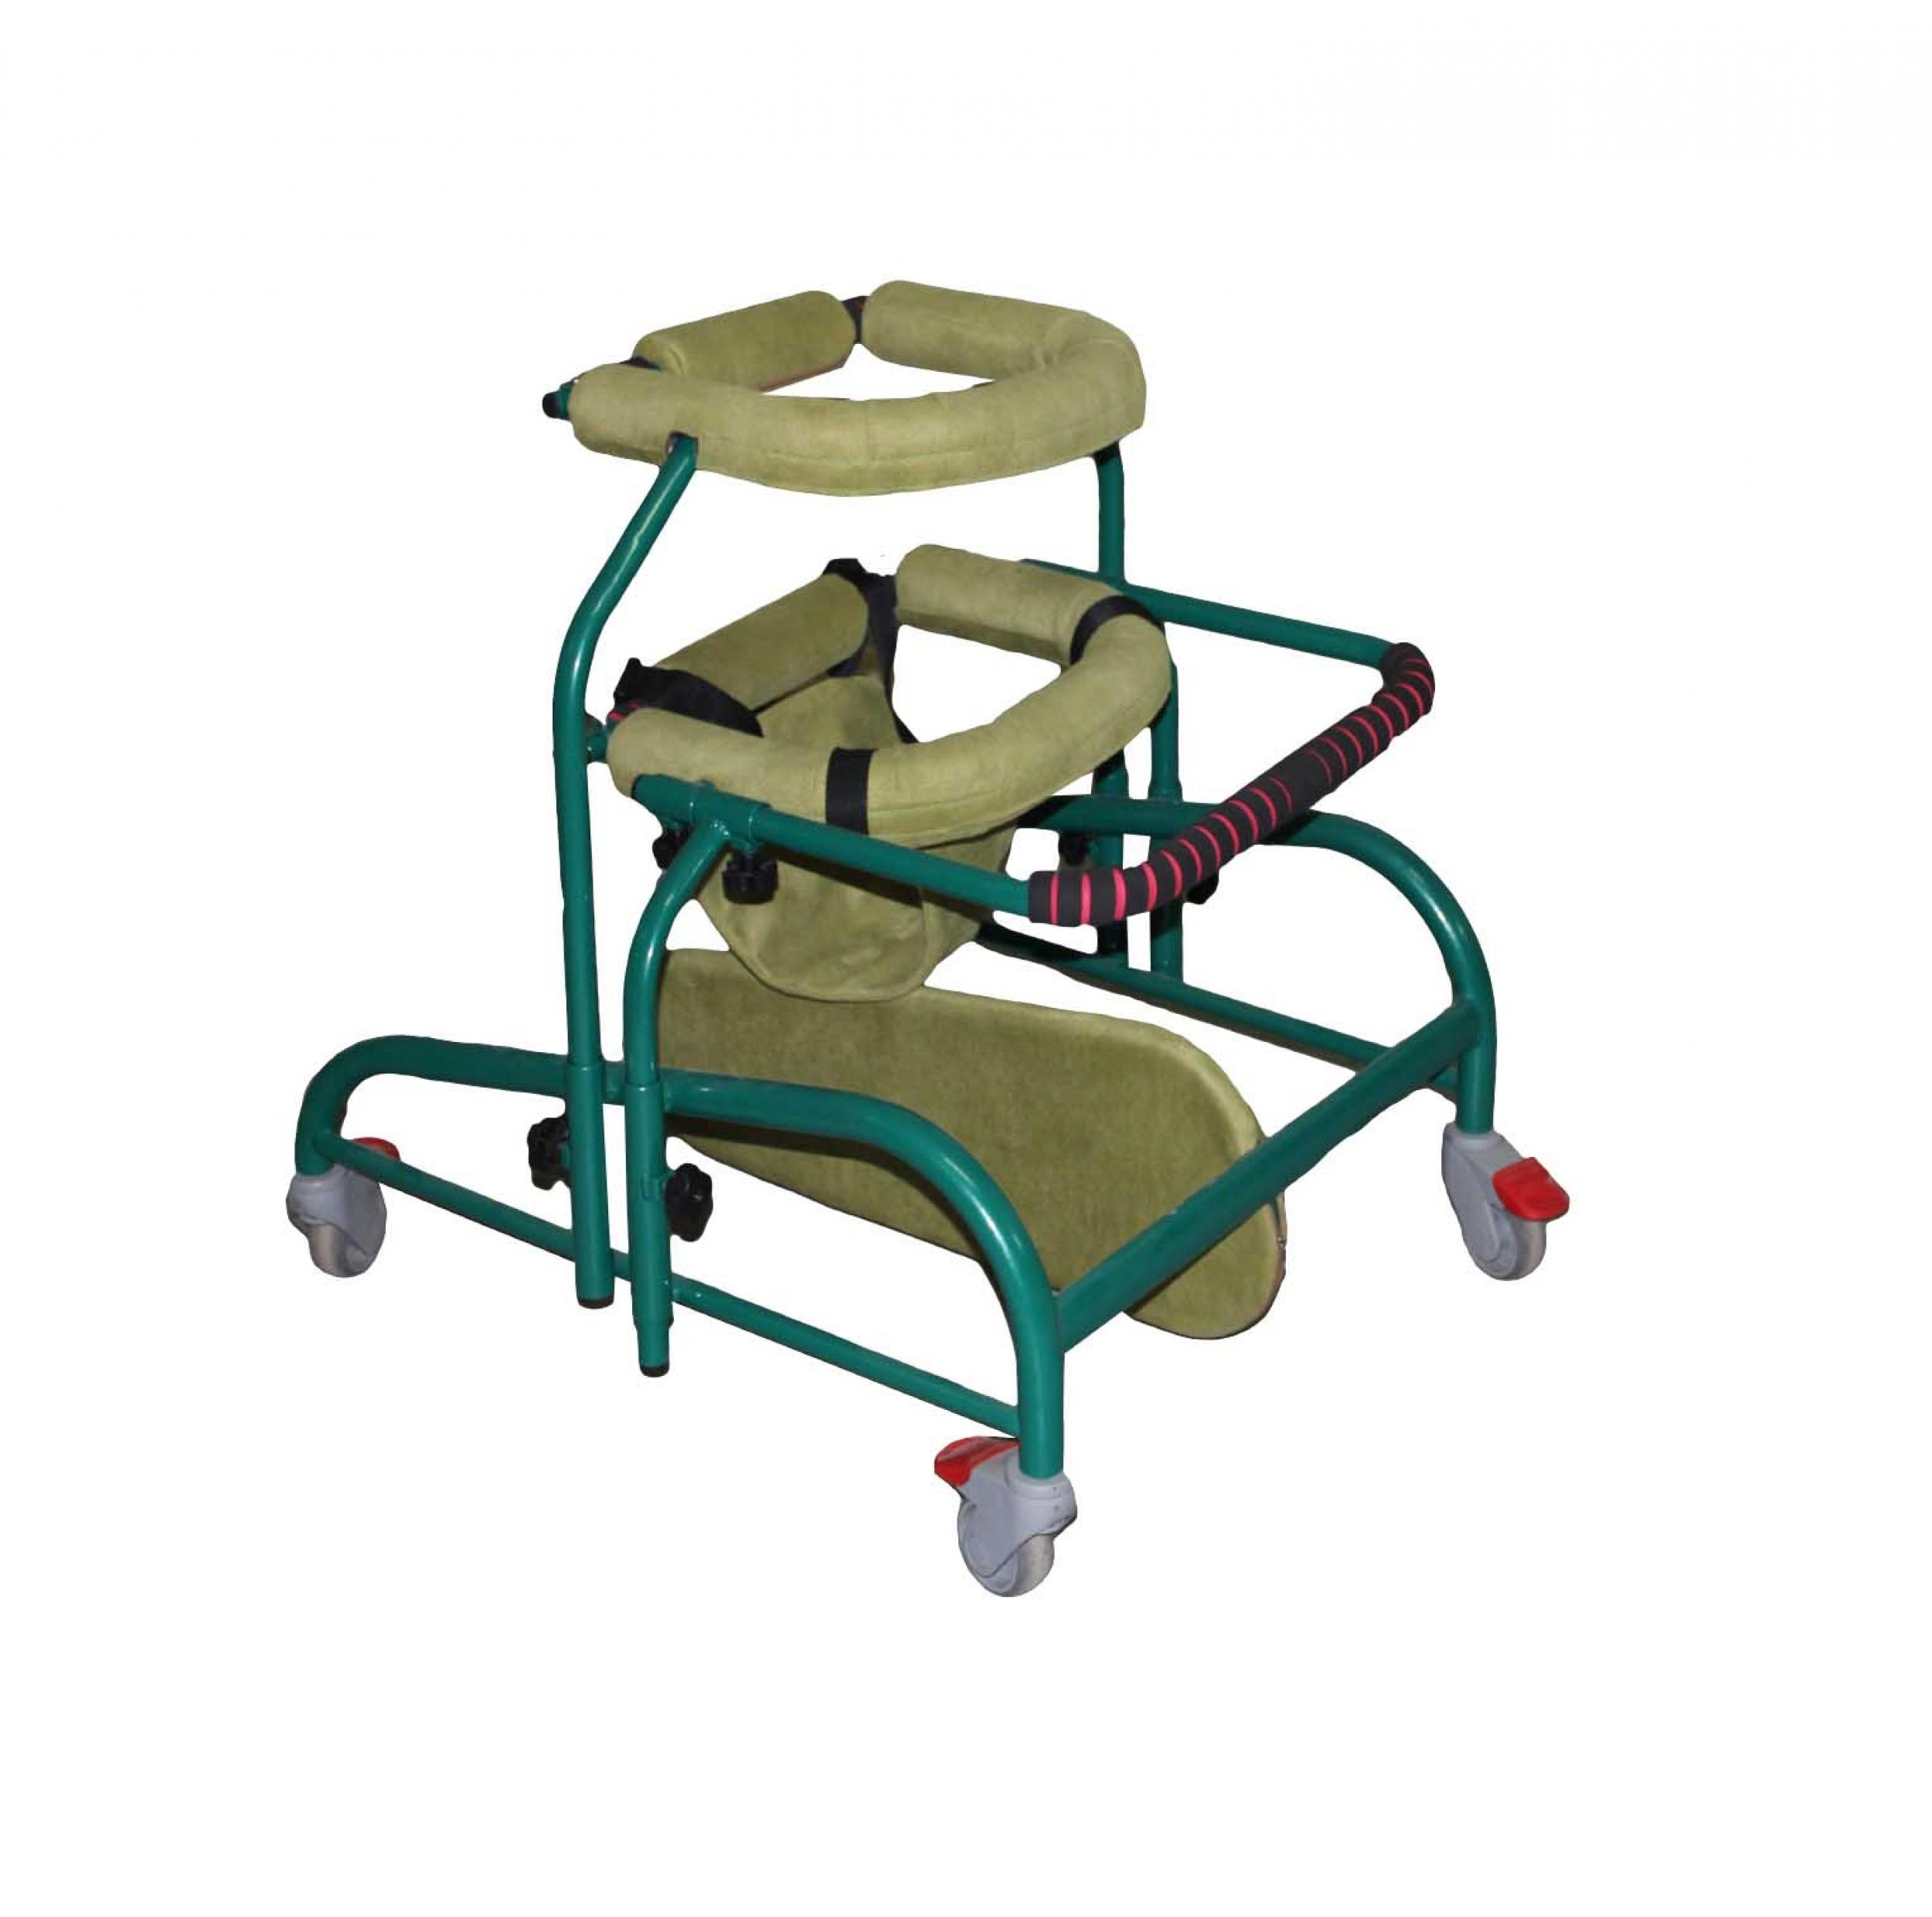 Ходунки на колесах для инвалидов ОХД-317 (Размер 1)